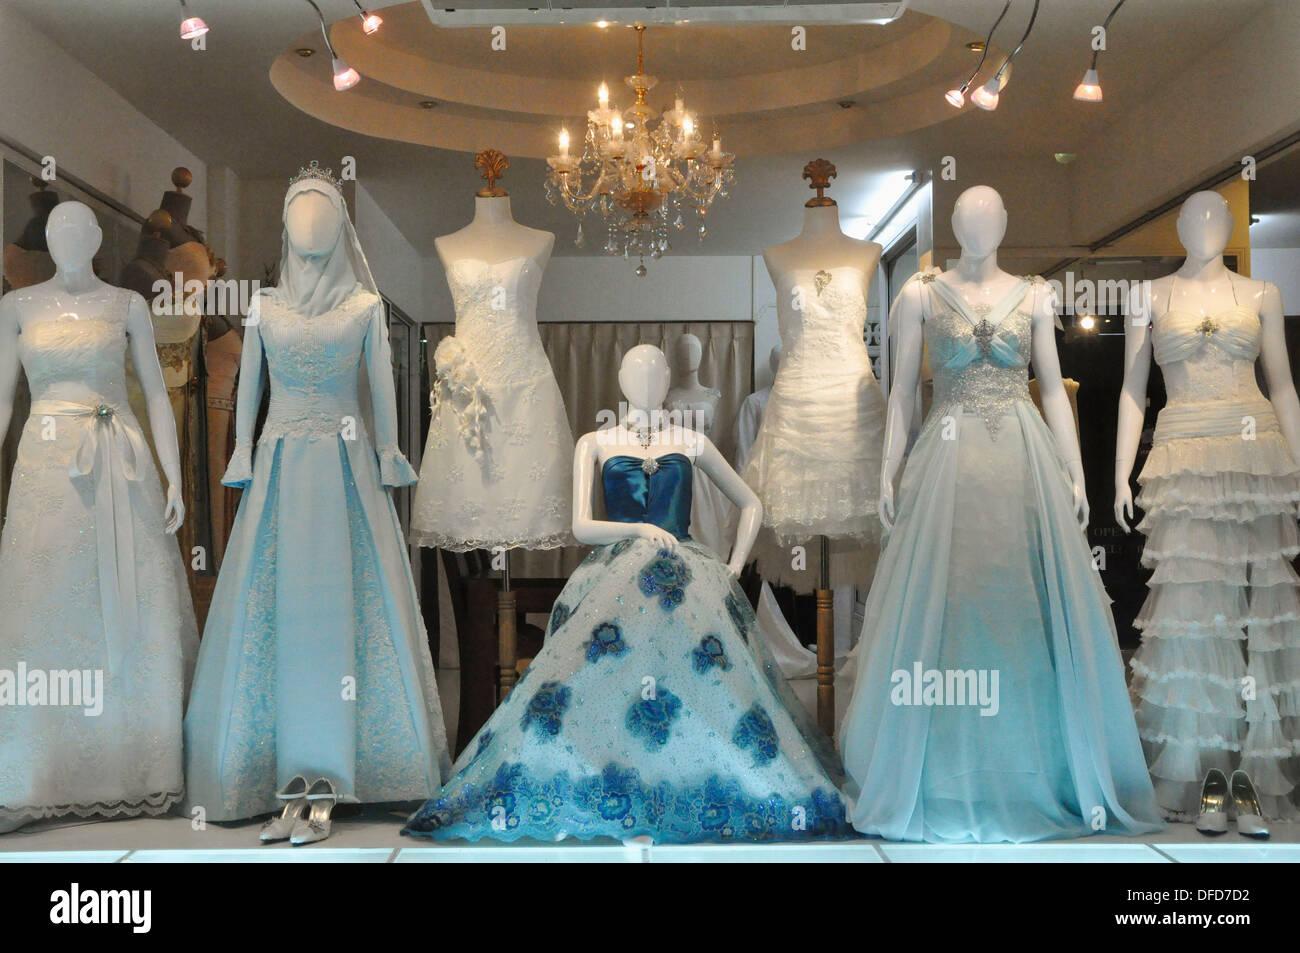 Pattaya (Thailand): a wedding dresses shop Stock Photo: 61142174 - Alamy